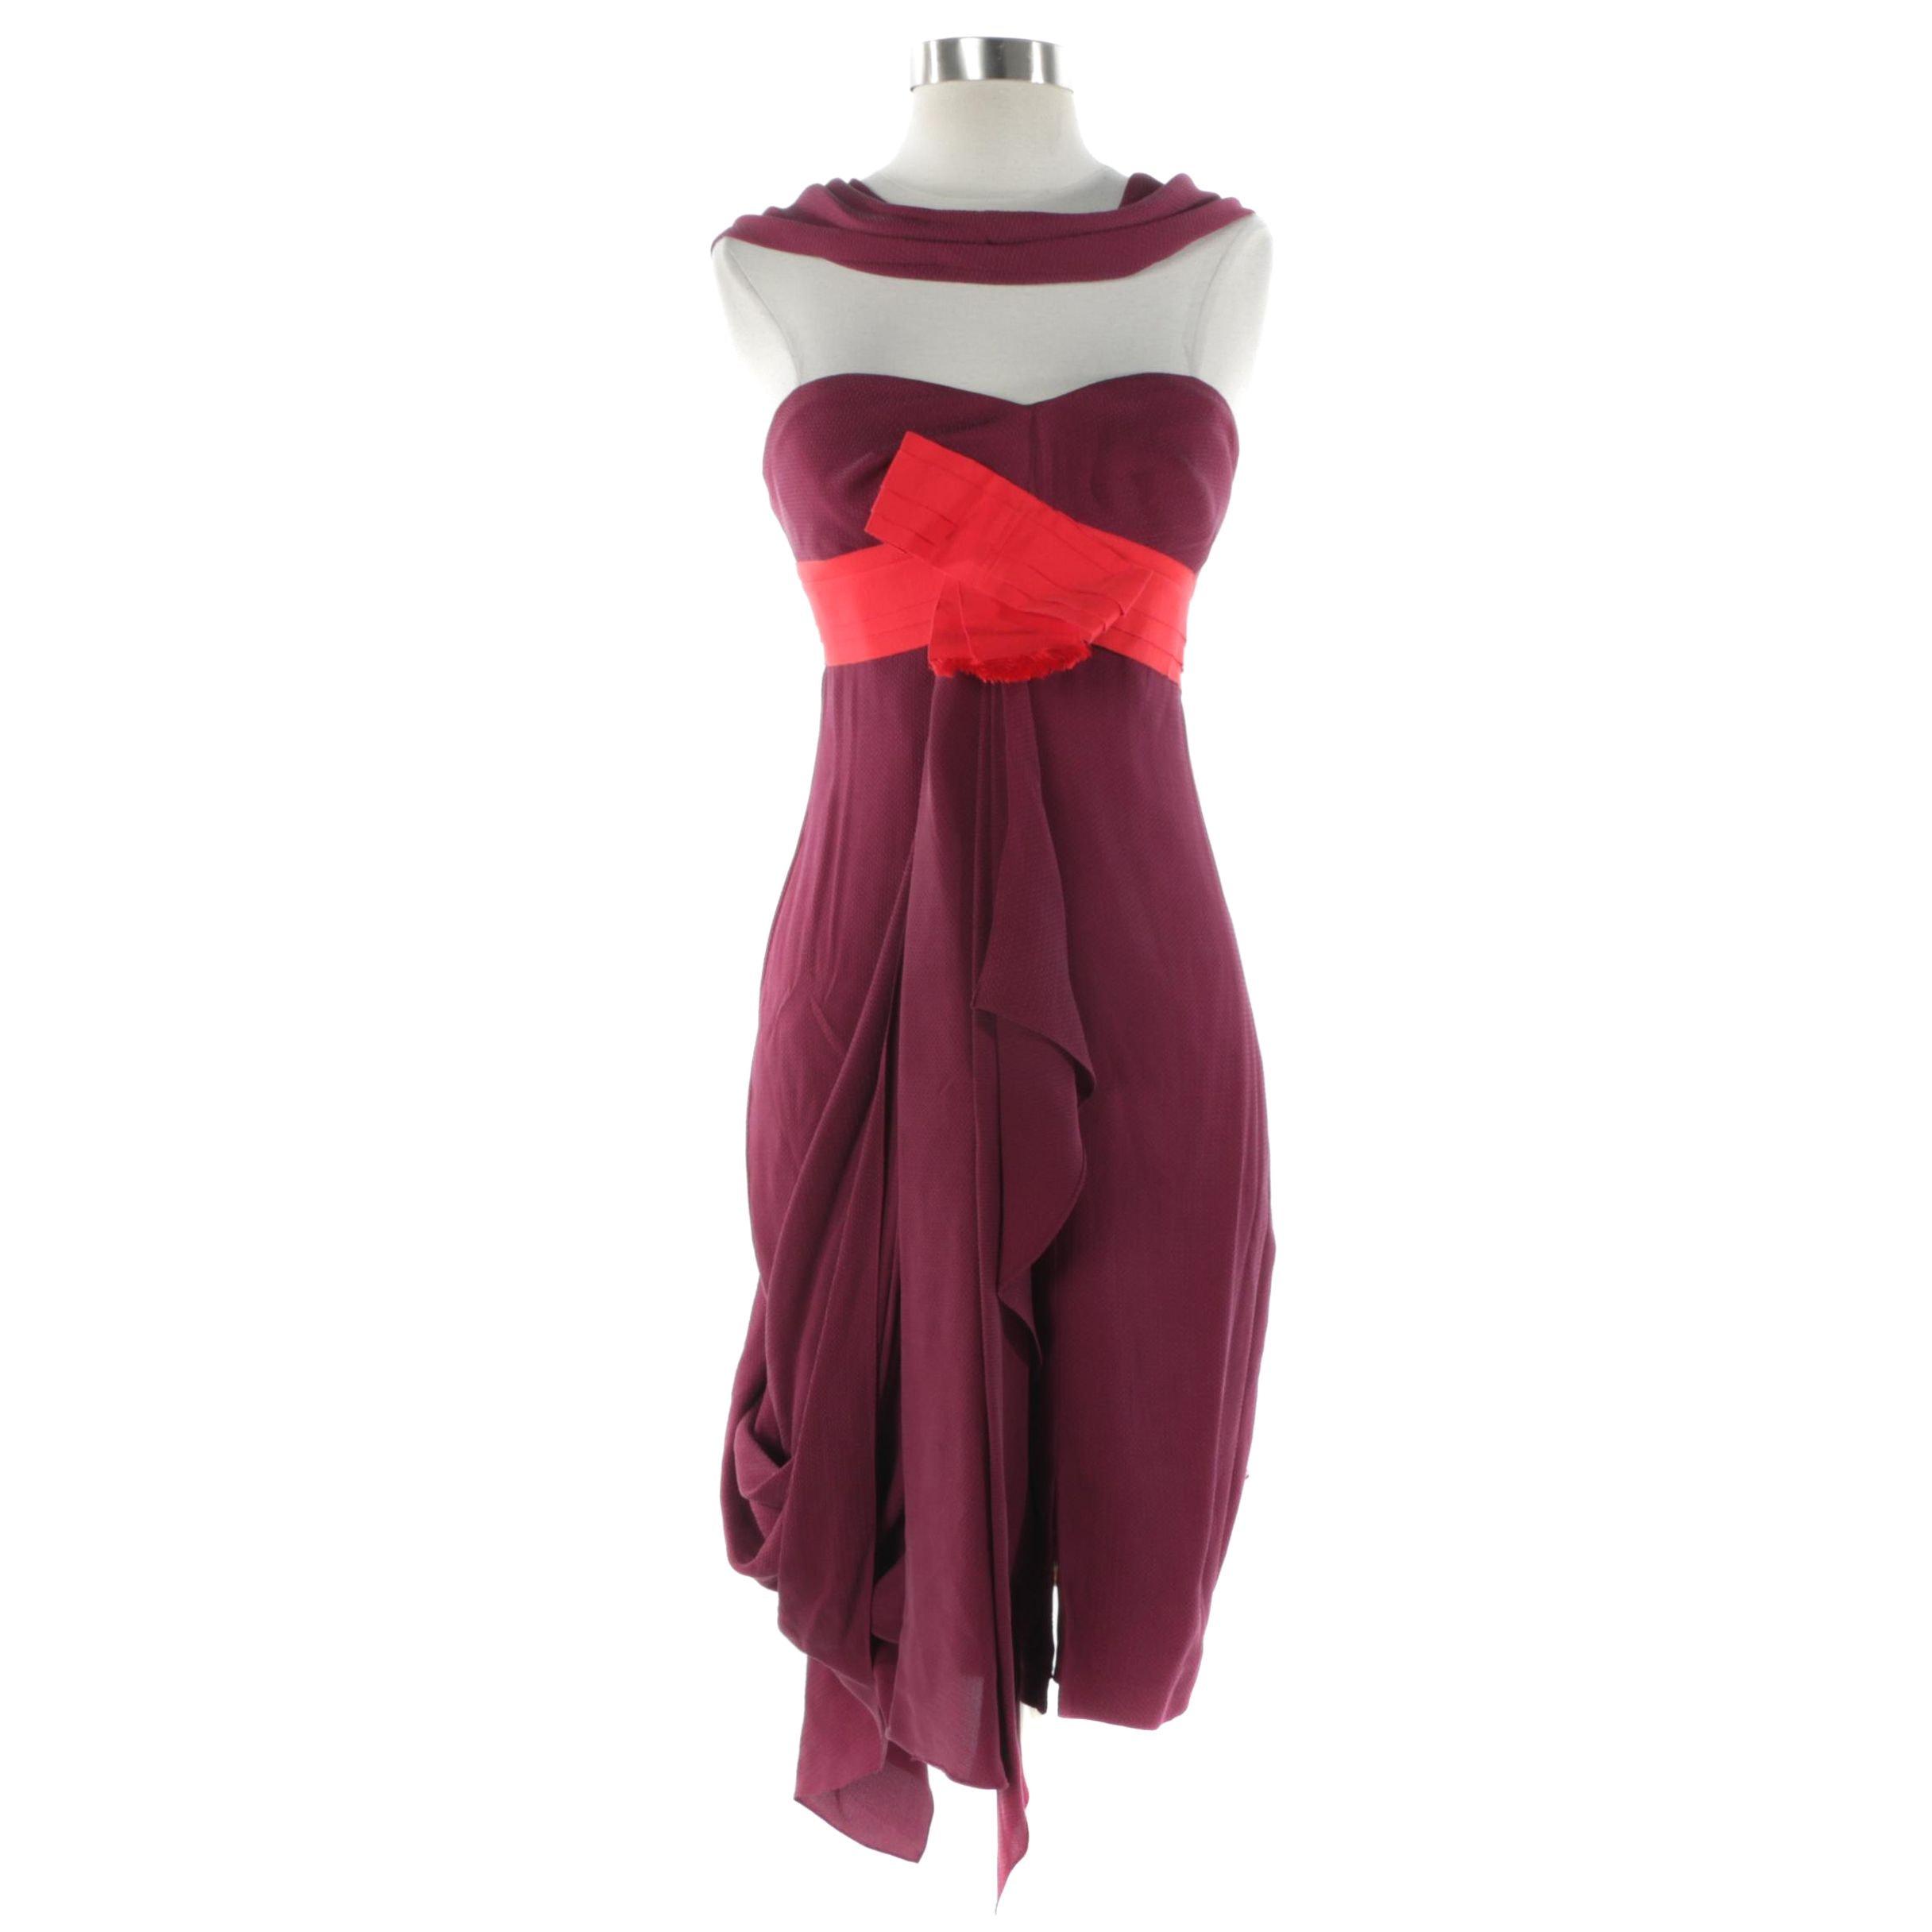 Carolina Herrera New York Silk Chiffon Cocktail Dress